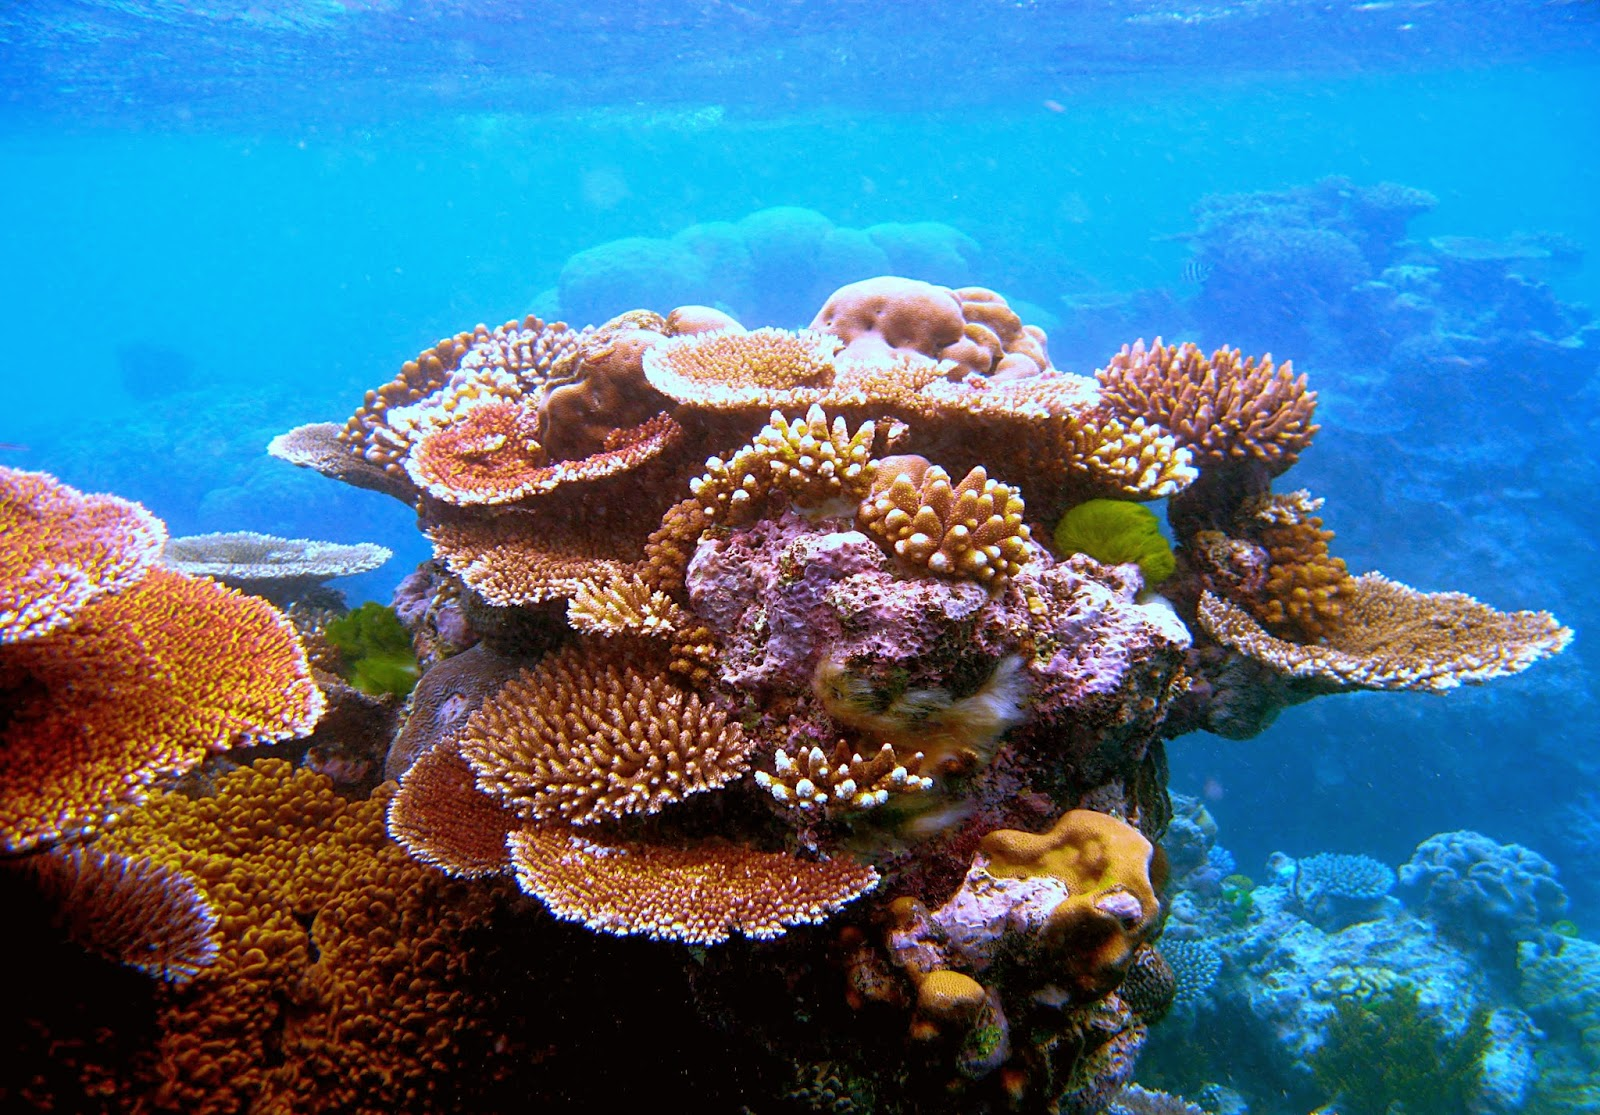 Desktop HD Wallpapers Free Downloads: Coral Reef HD Wallpapers